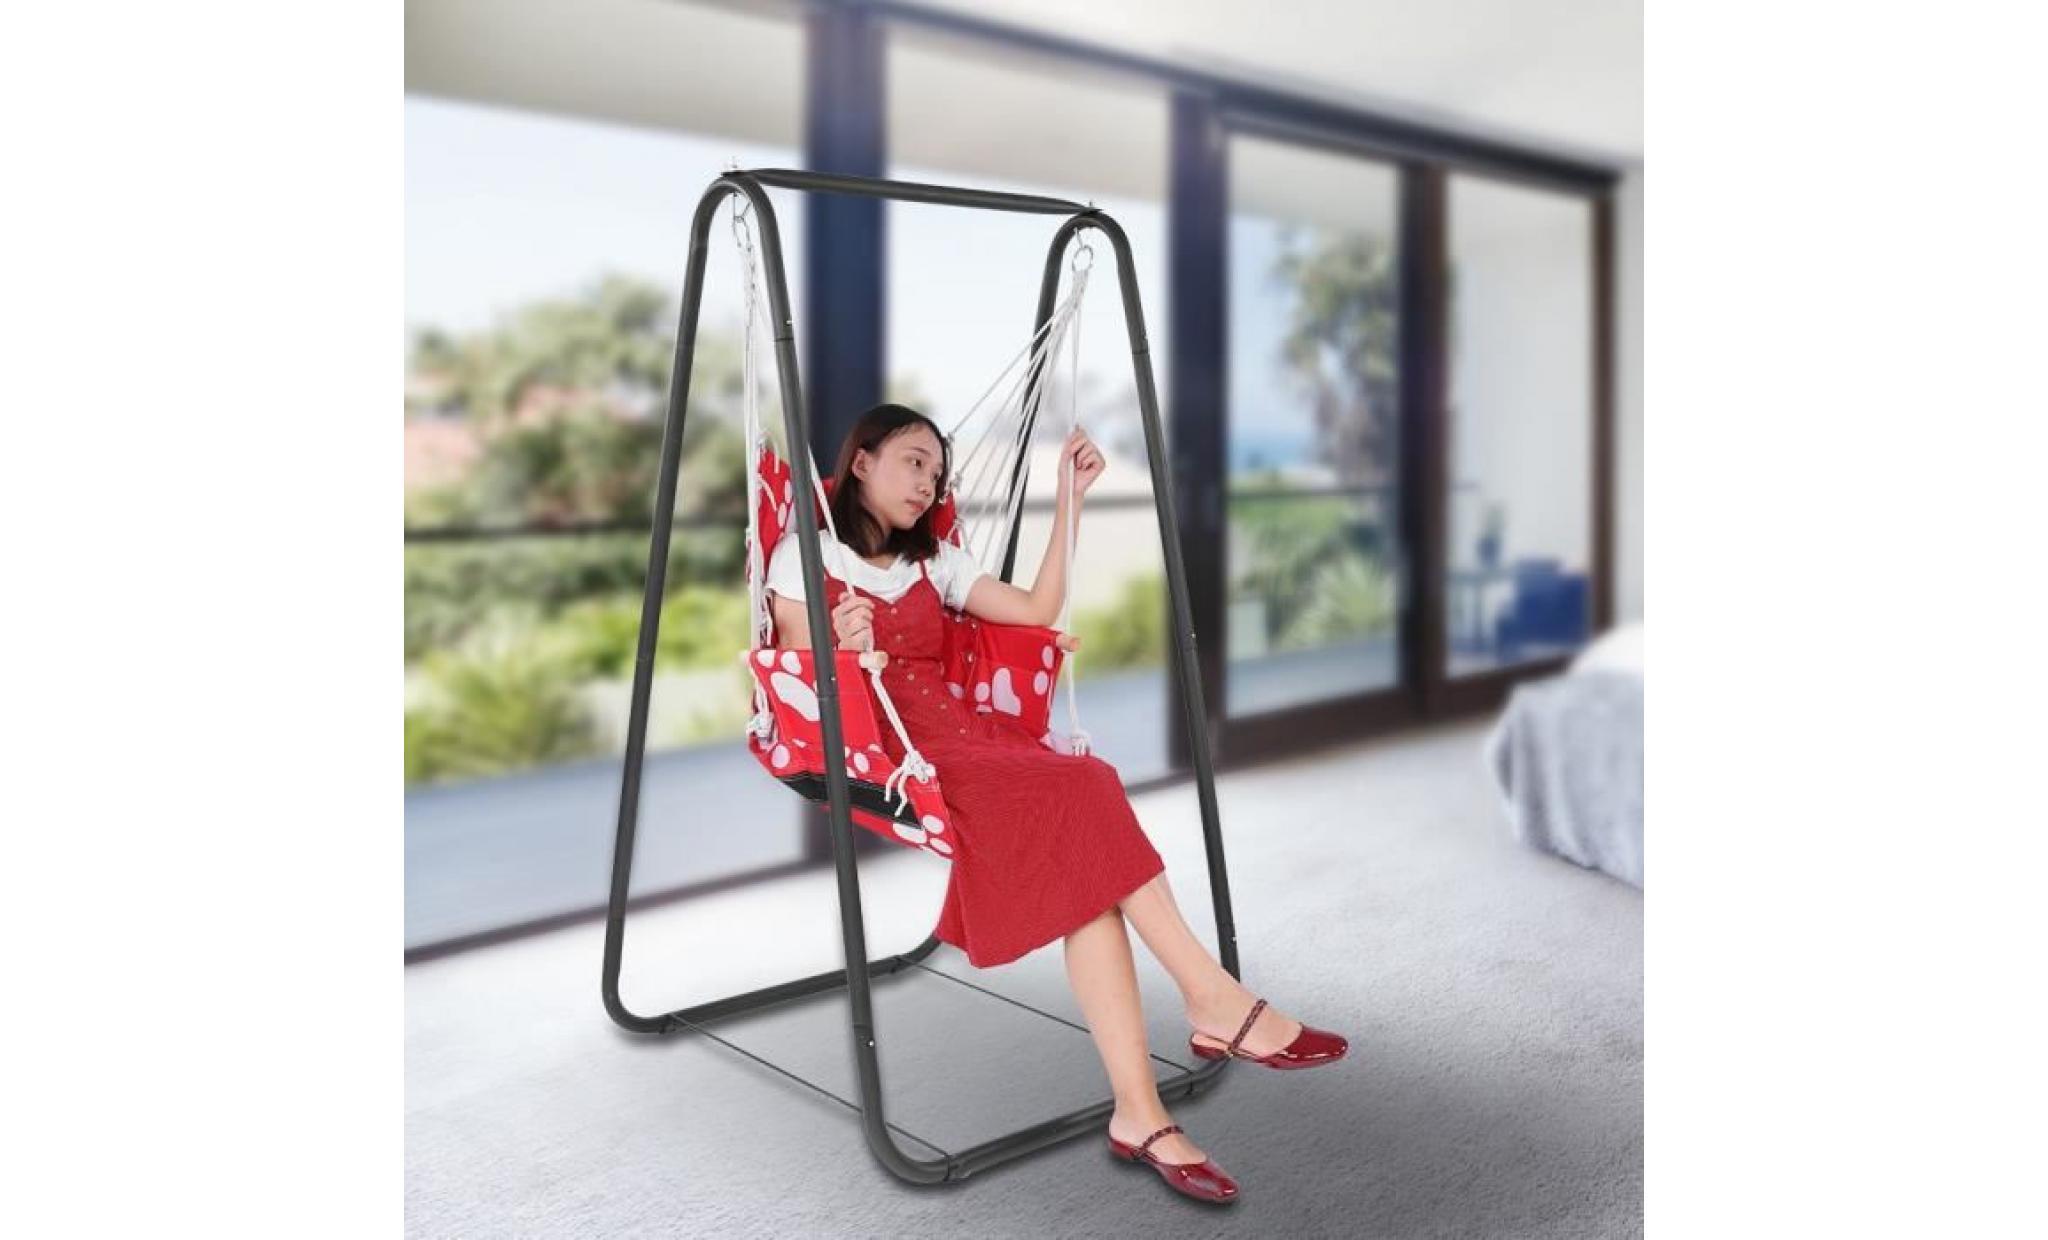 si ge de balan oire pour enfant garden yard hamac. Black Bedroom Furniture Sets. Home Design Ideas